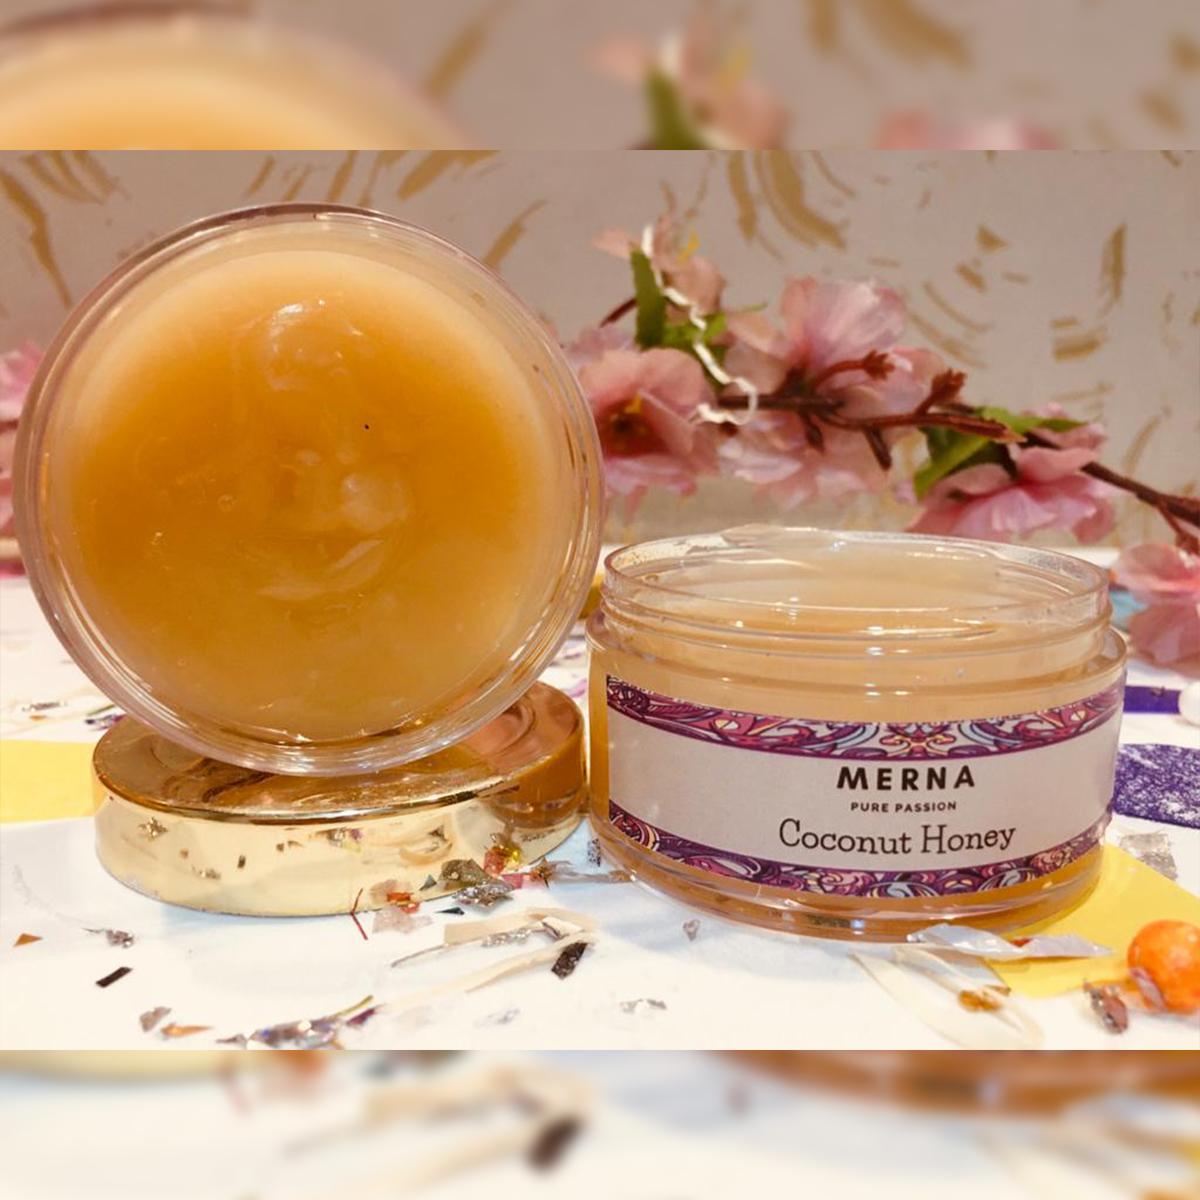 Coconut Milk & Honey Cream Merna only interviews